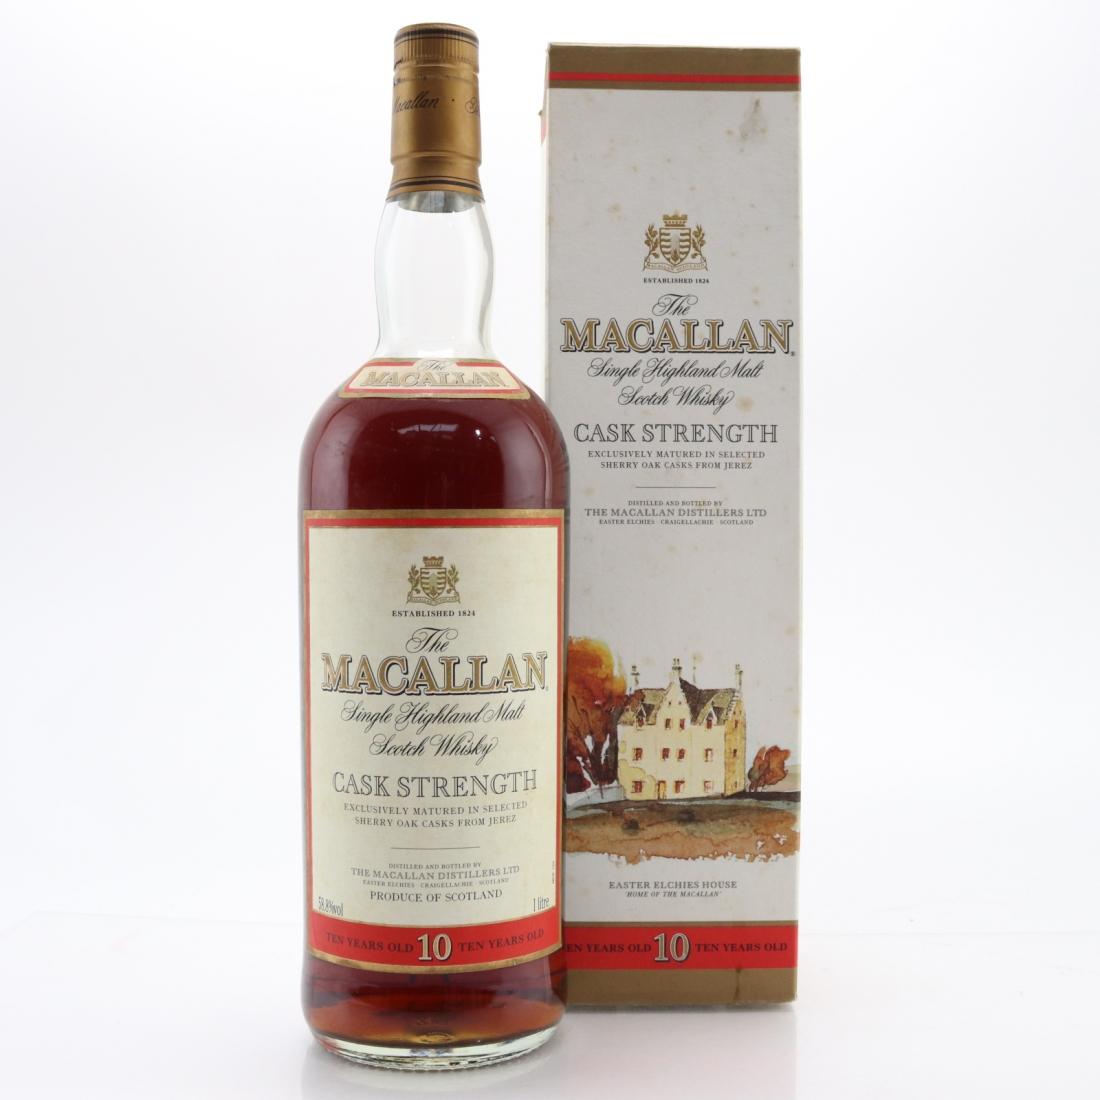 Macallan 10 Year Old Cask Strength 1 Litre / 58.8%